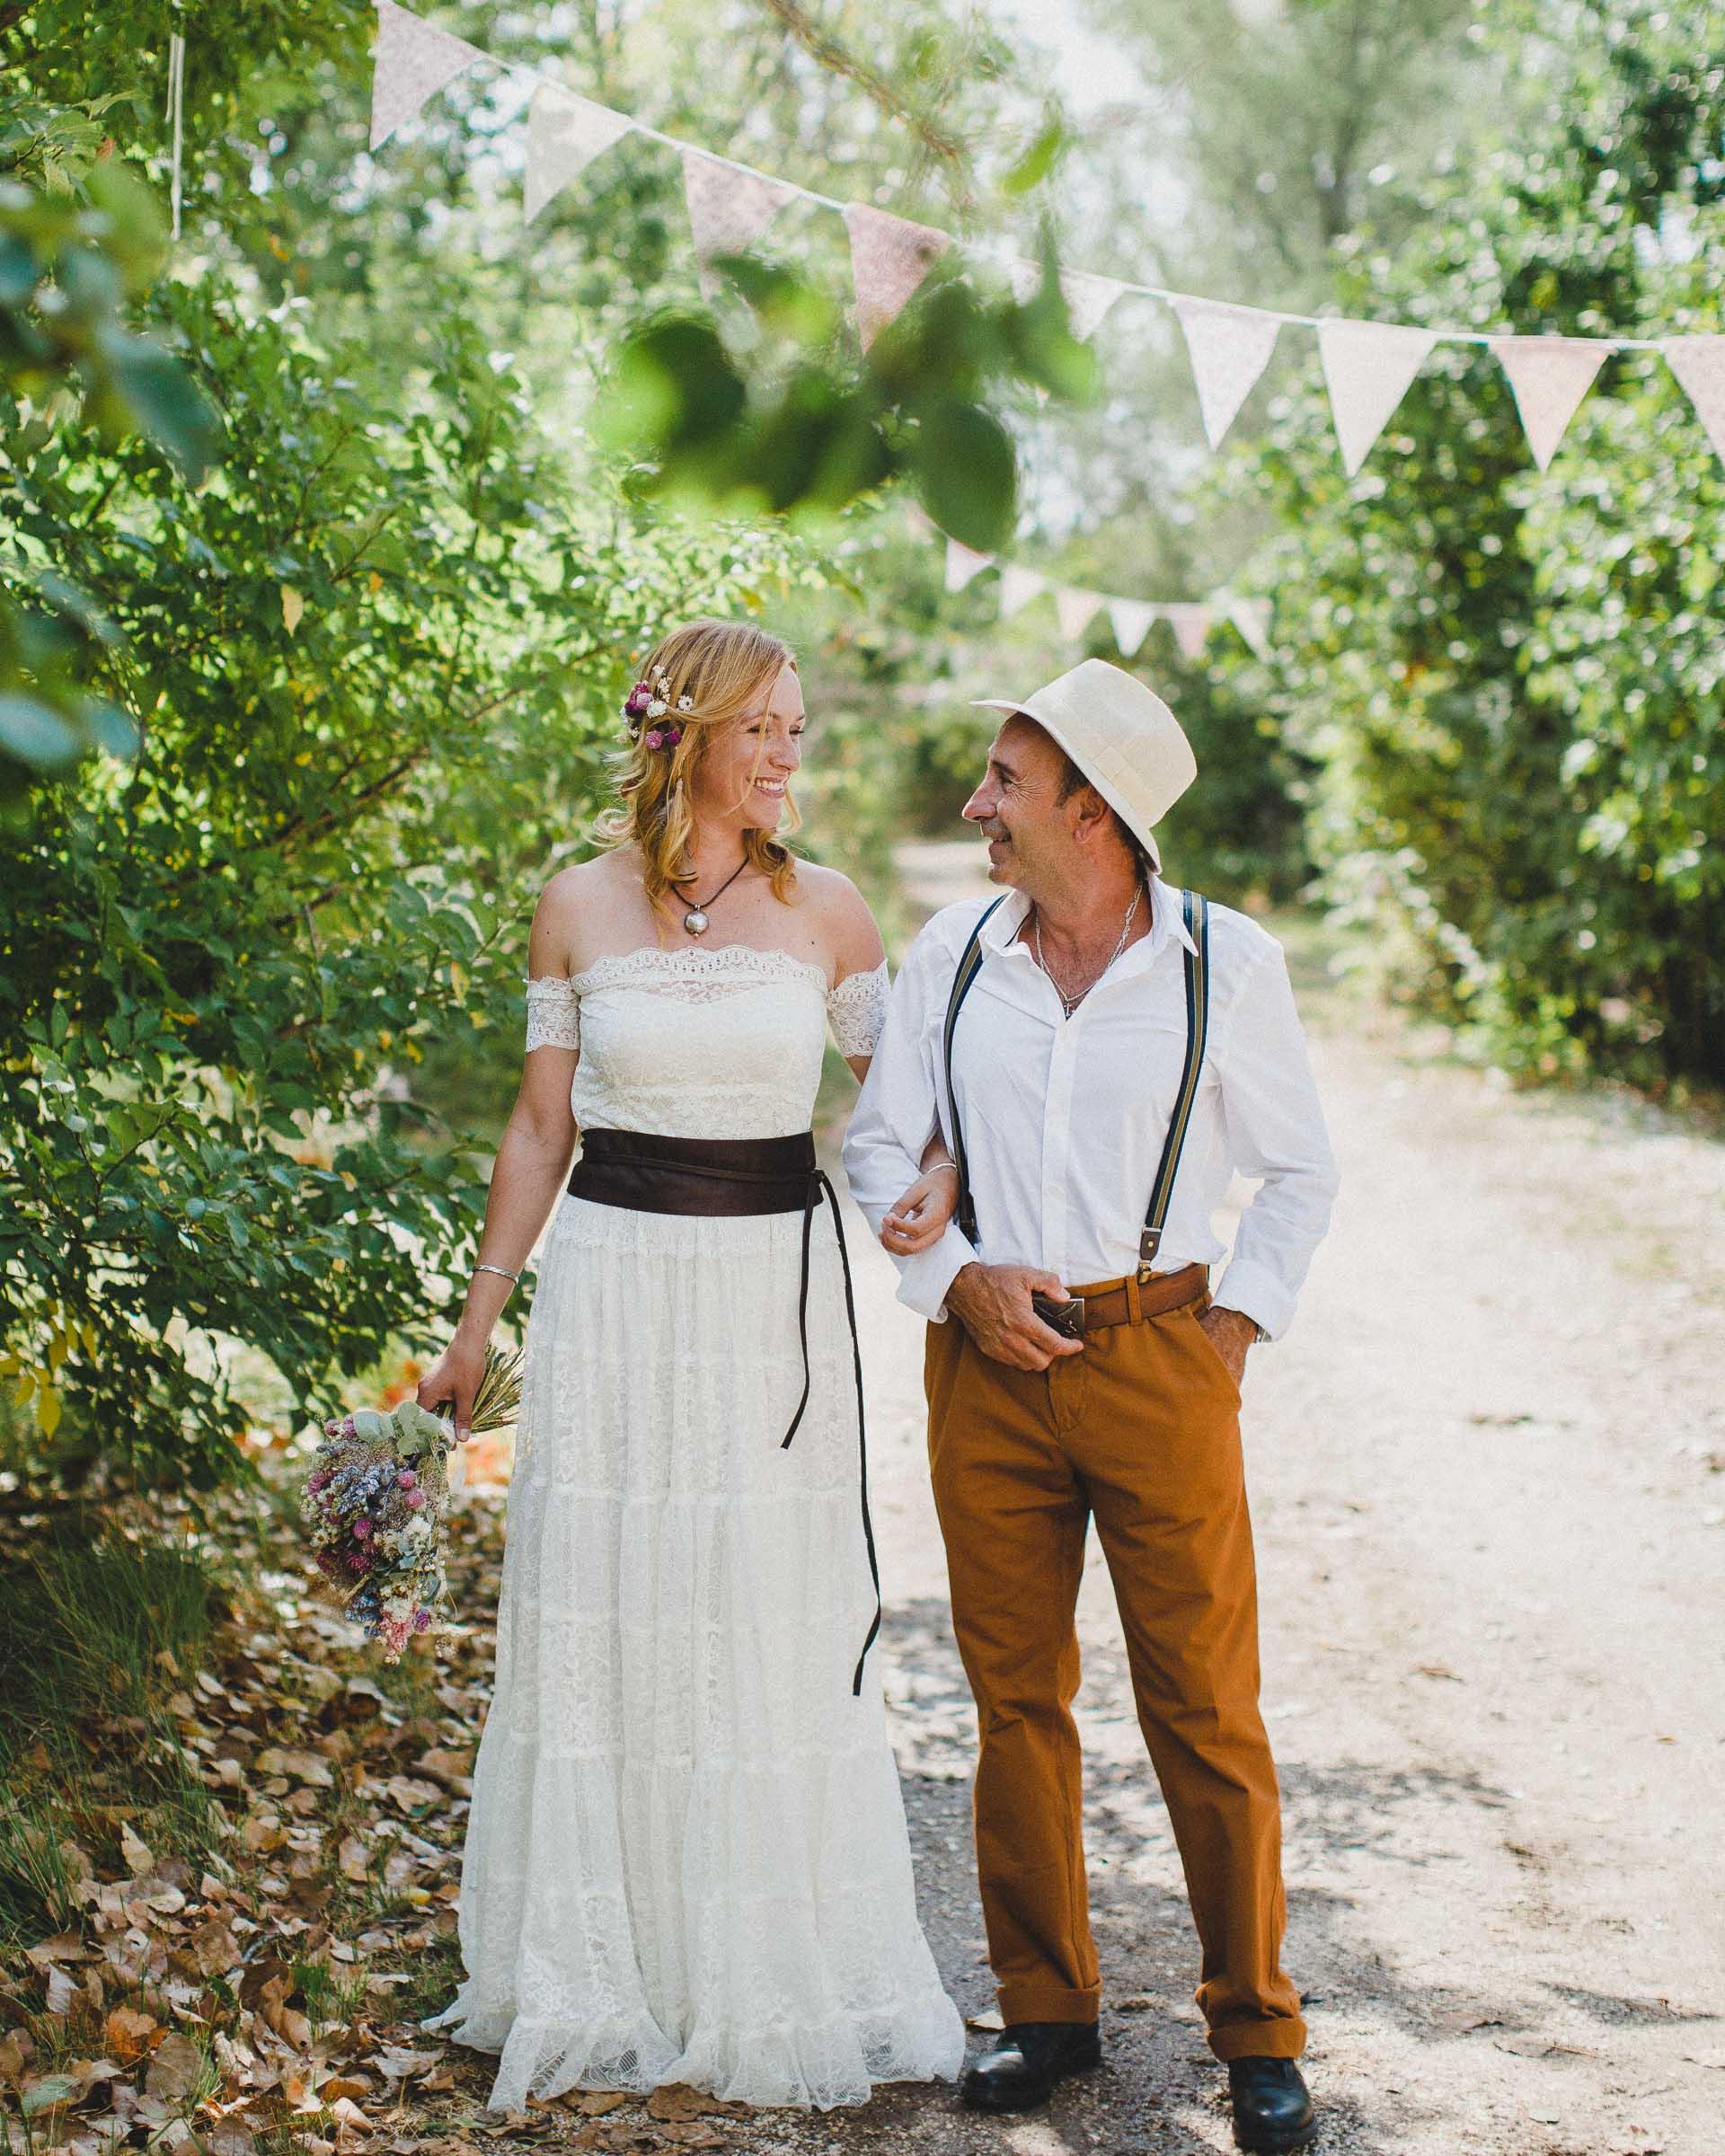 Lea & David Americana Folk Wedding France by Jean-Laurent Gaudy Photography-13